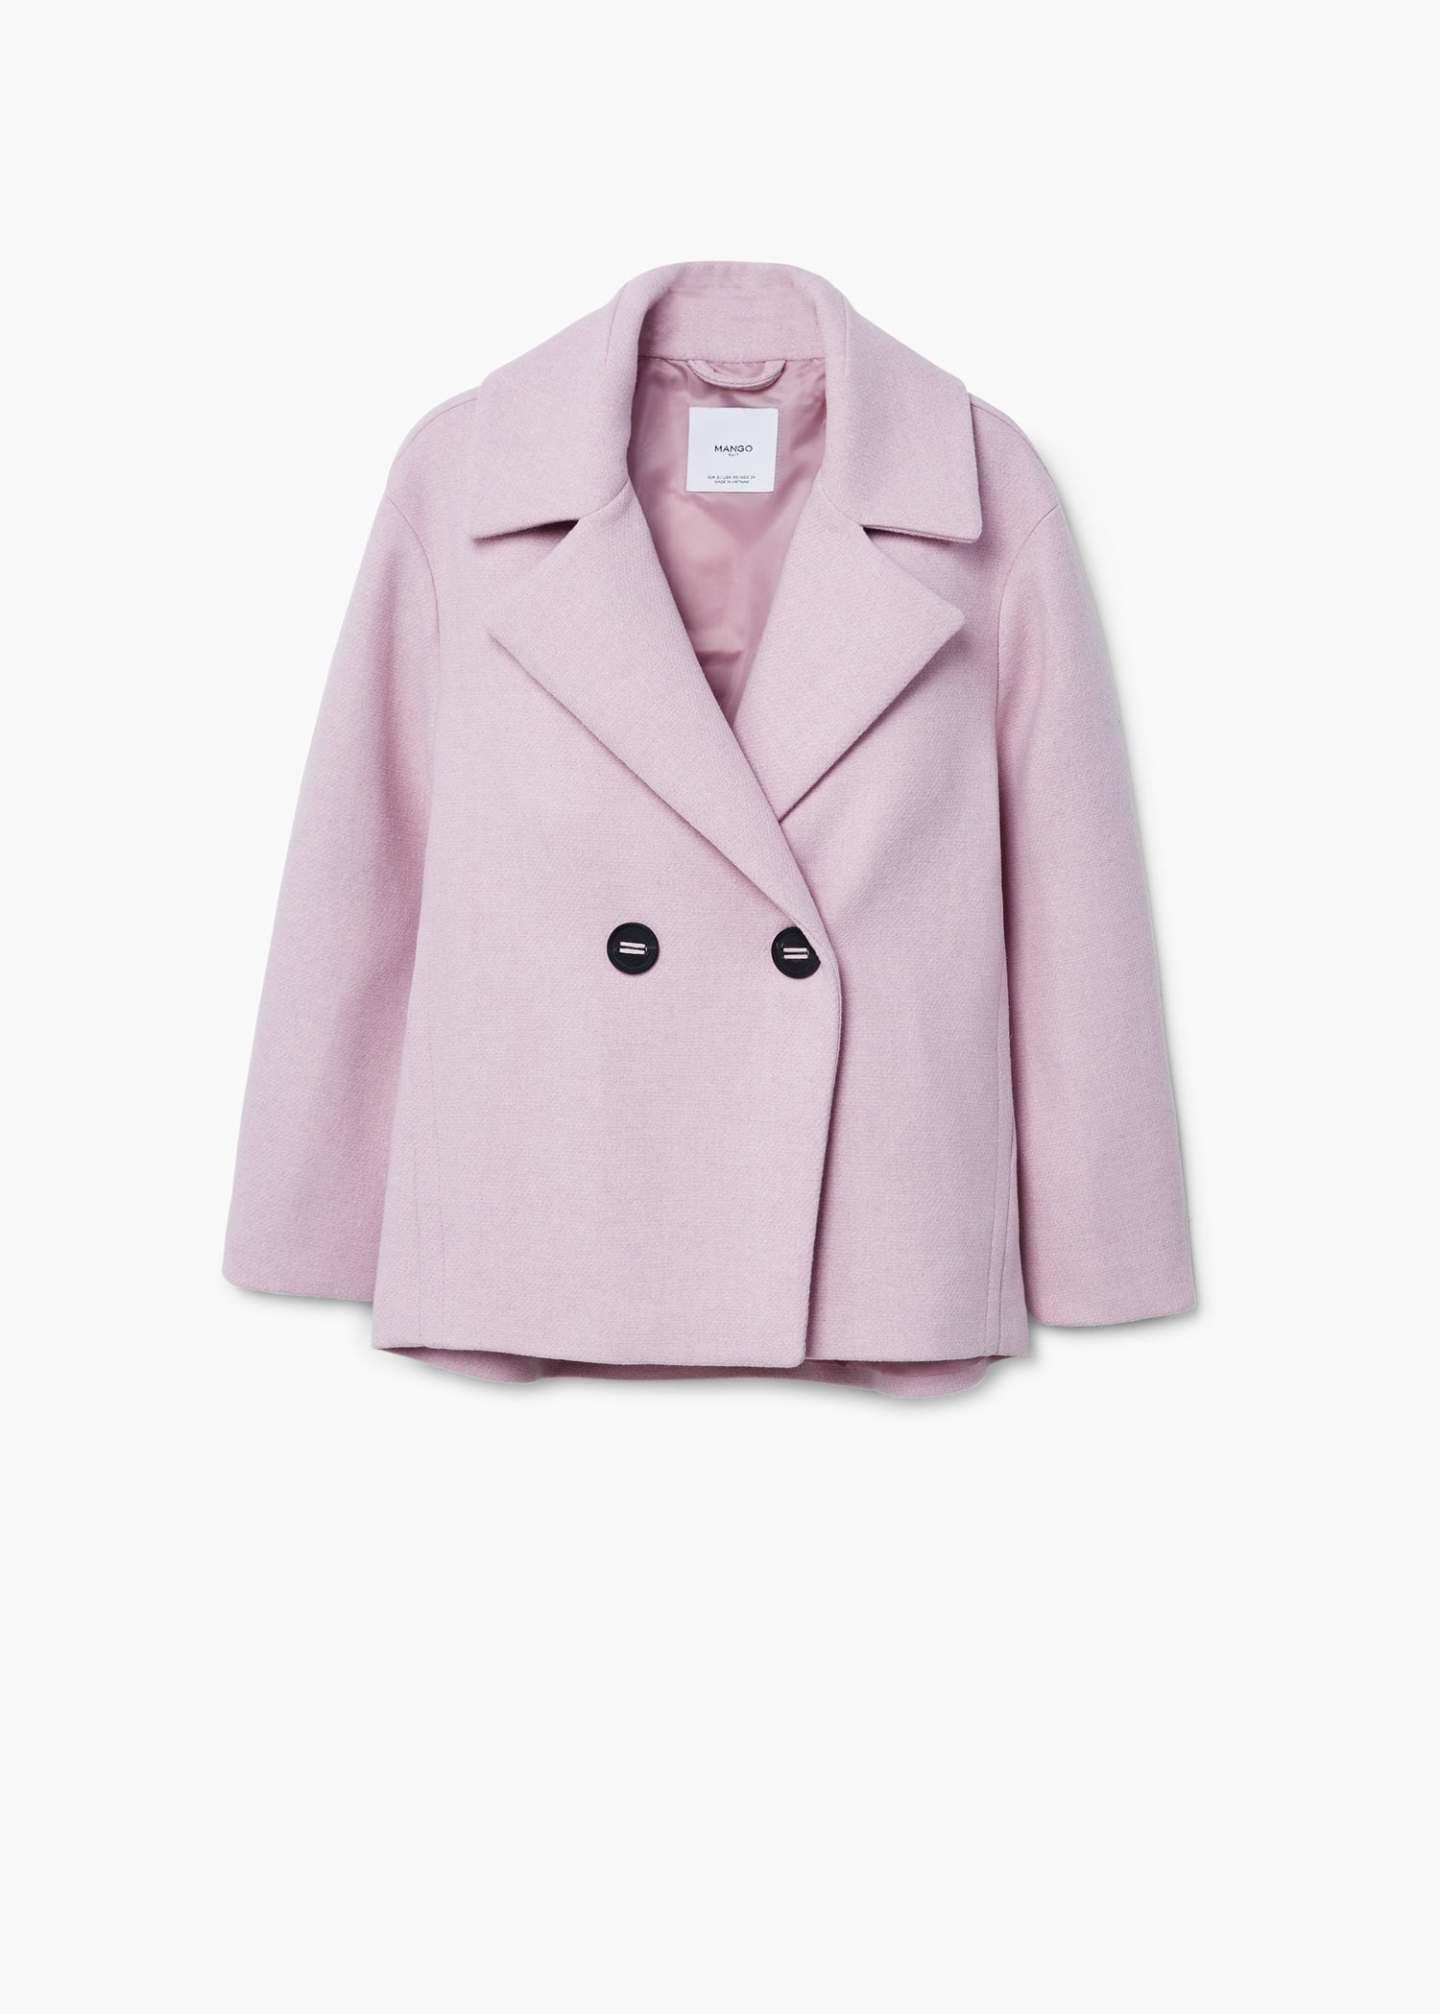 Mango pastel pink coat